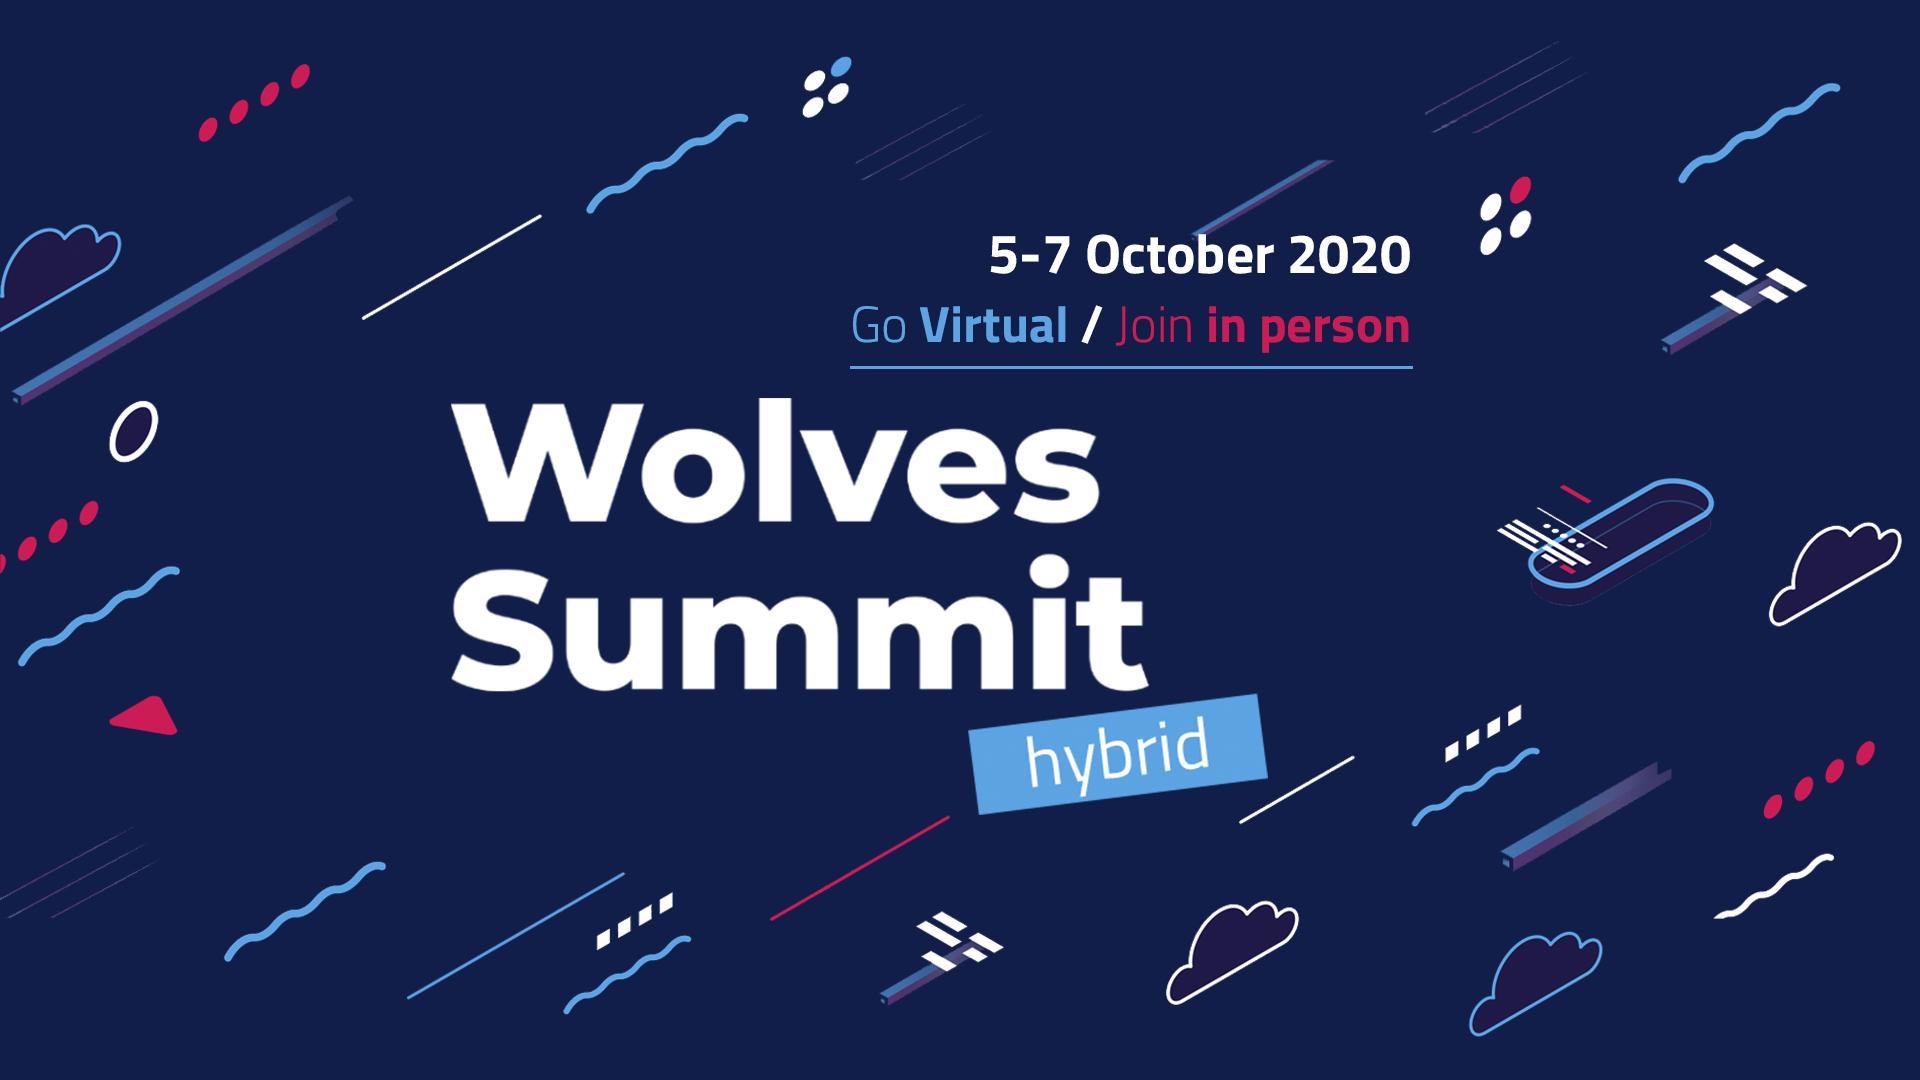 CCE Polska partnerem Wolves Summit – skorzystaj z kodu rabatowego!